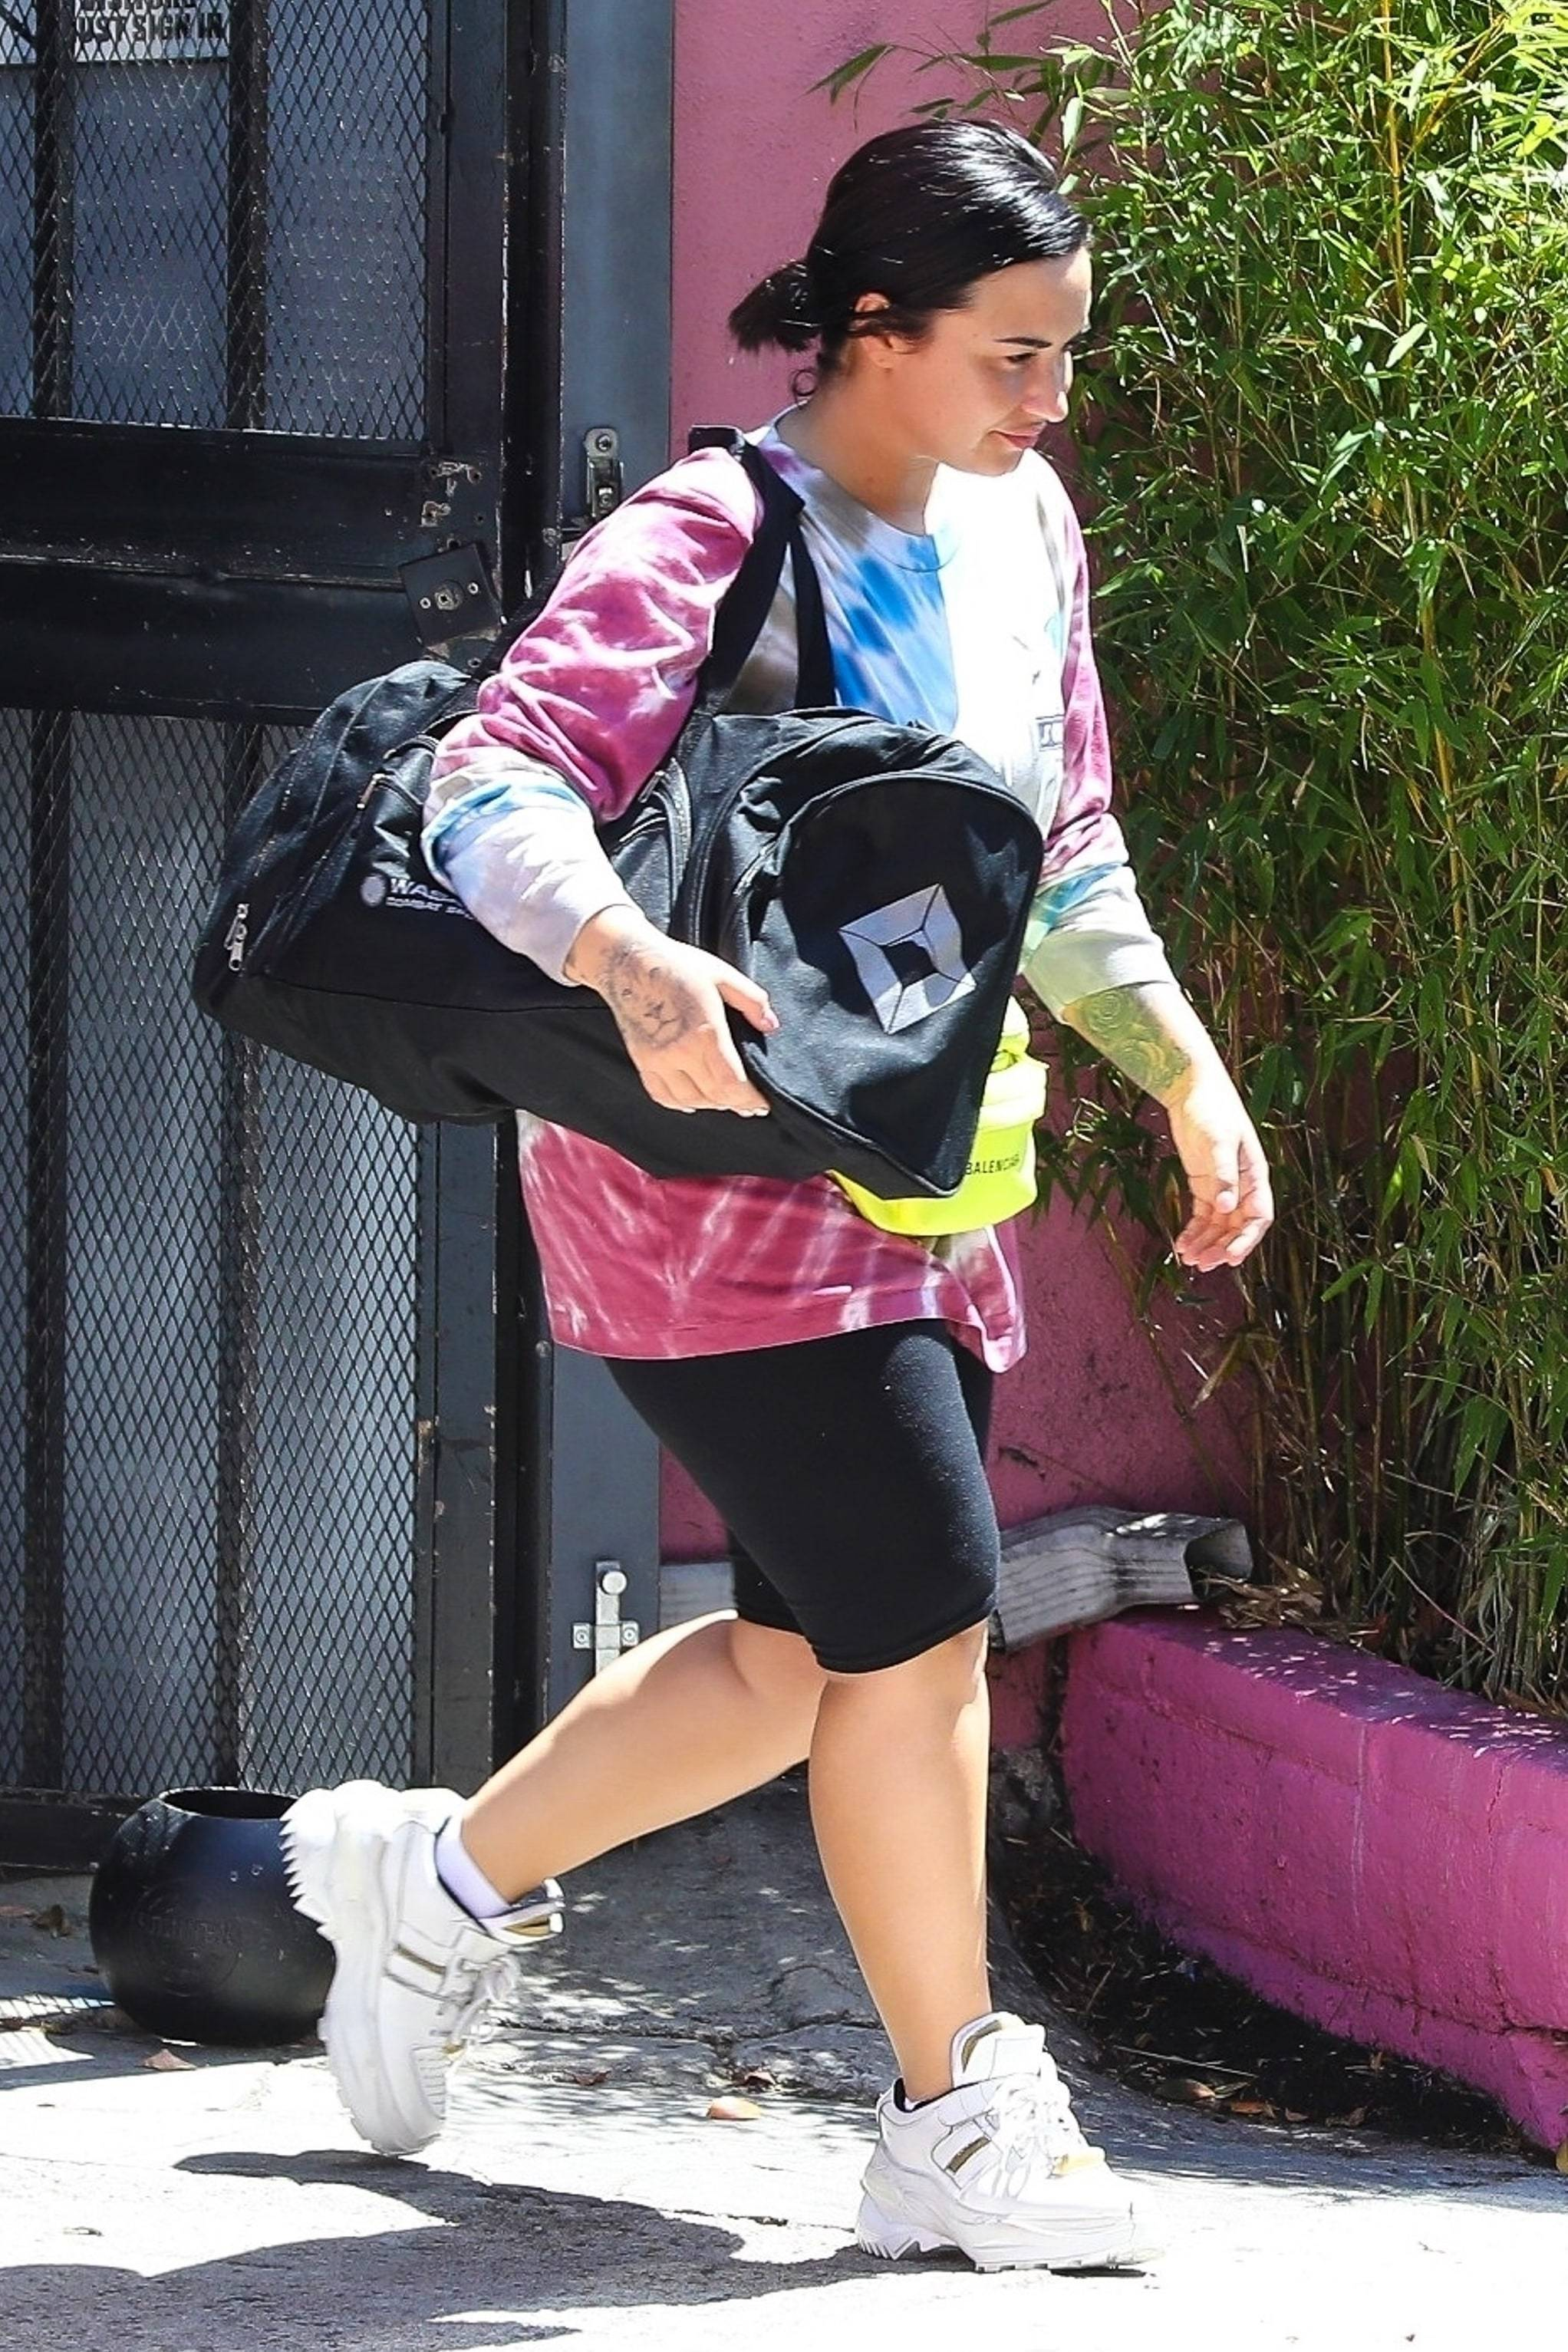 shorts demi lovato celebrity workout pants sporty sneakers